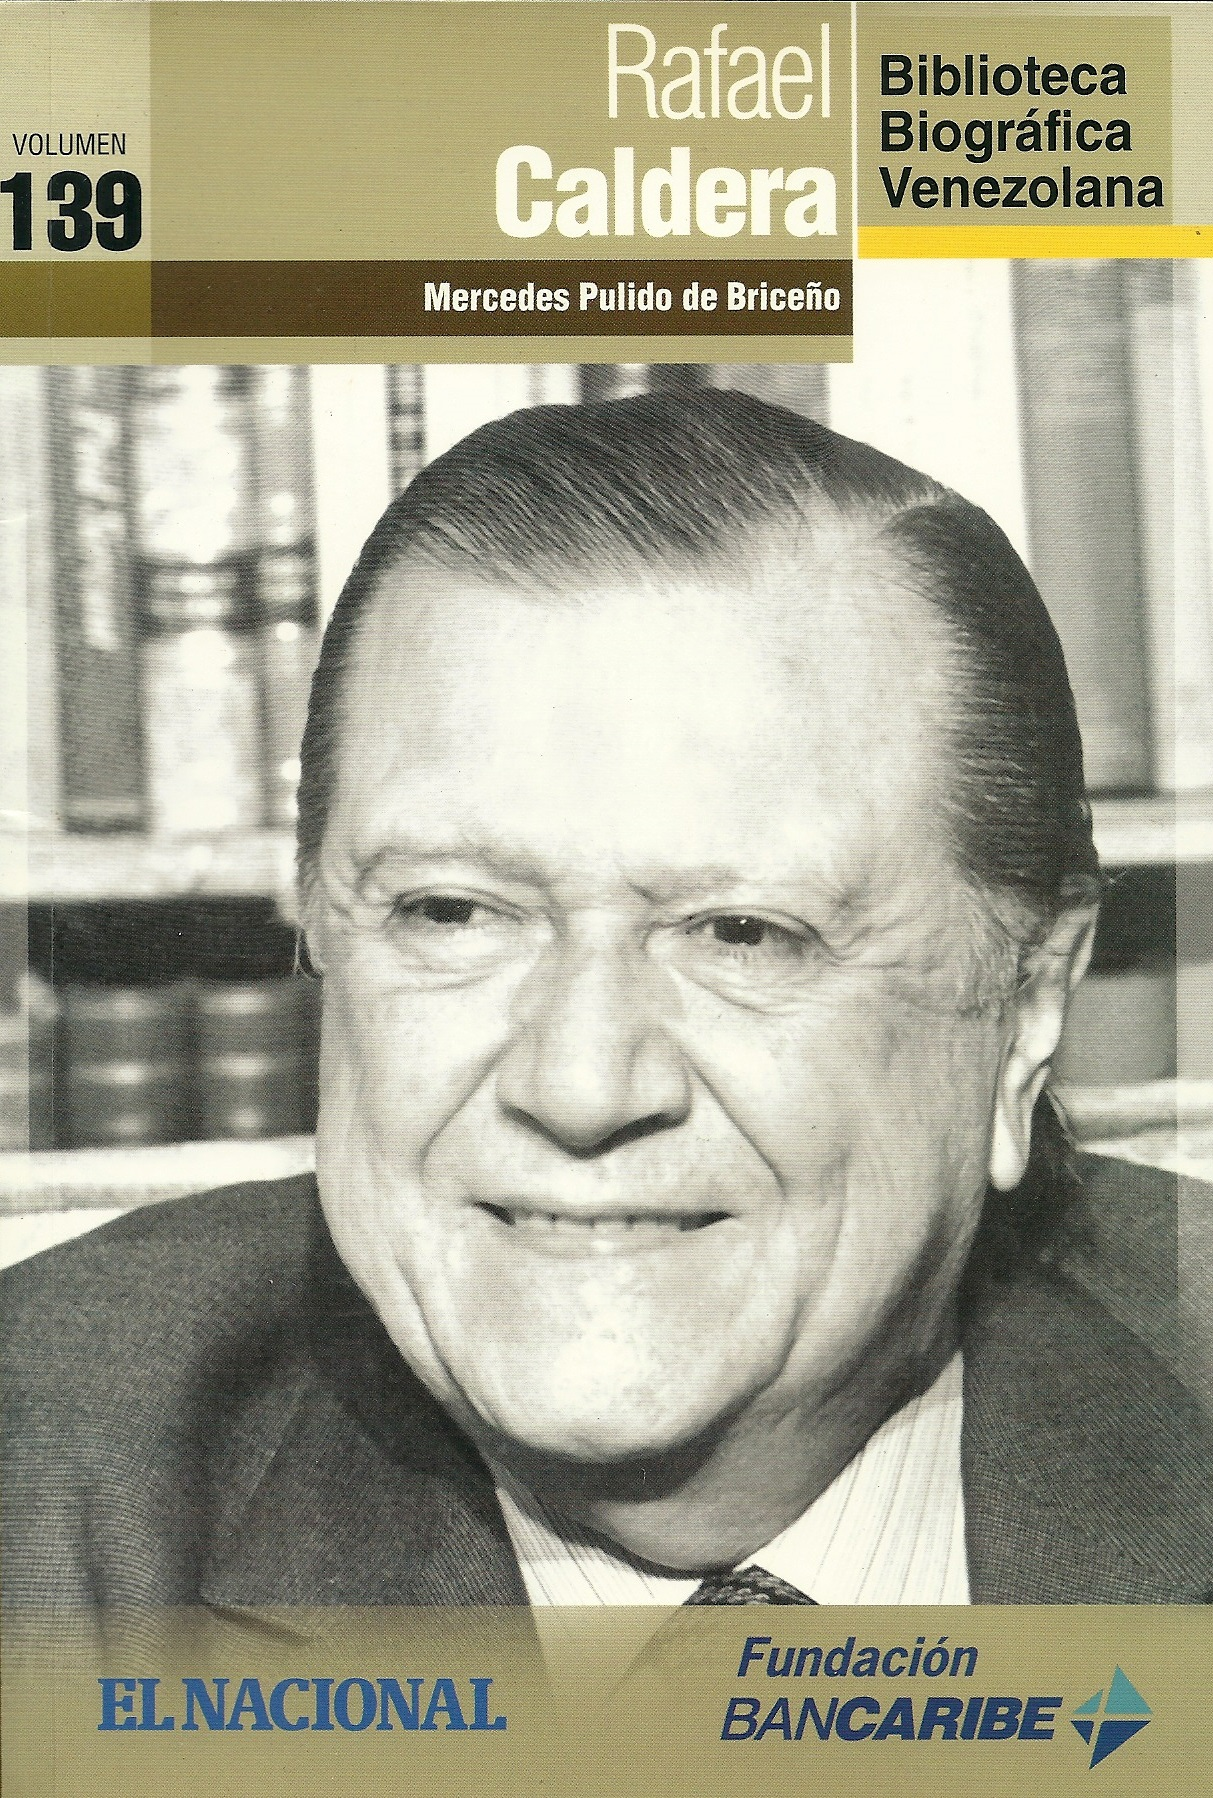 Rafael Caldera, el civilista – Mercedes Pulido de Briceño (2011)